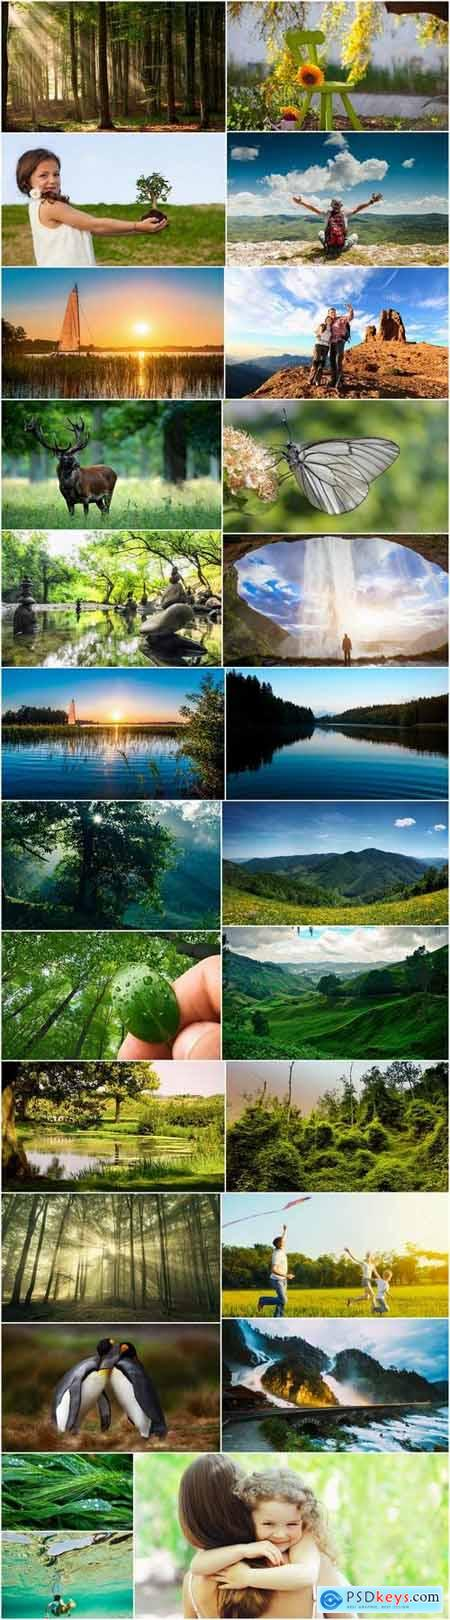 Nature landscape lake river animal 25 HQ Jpeg